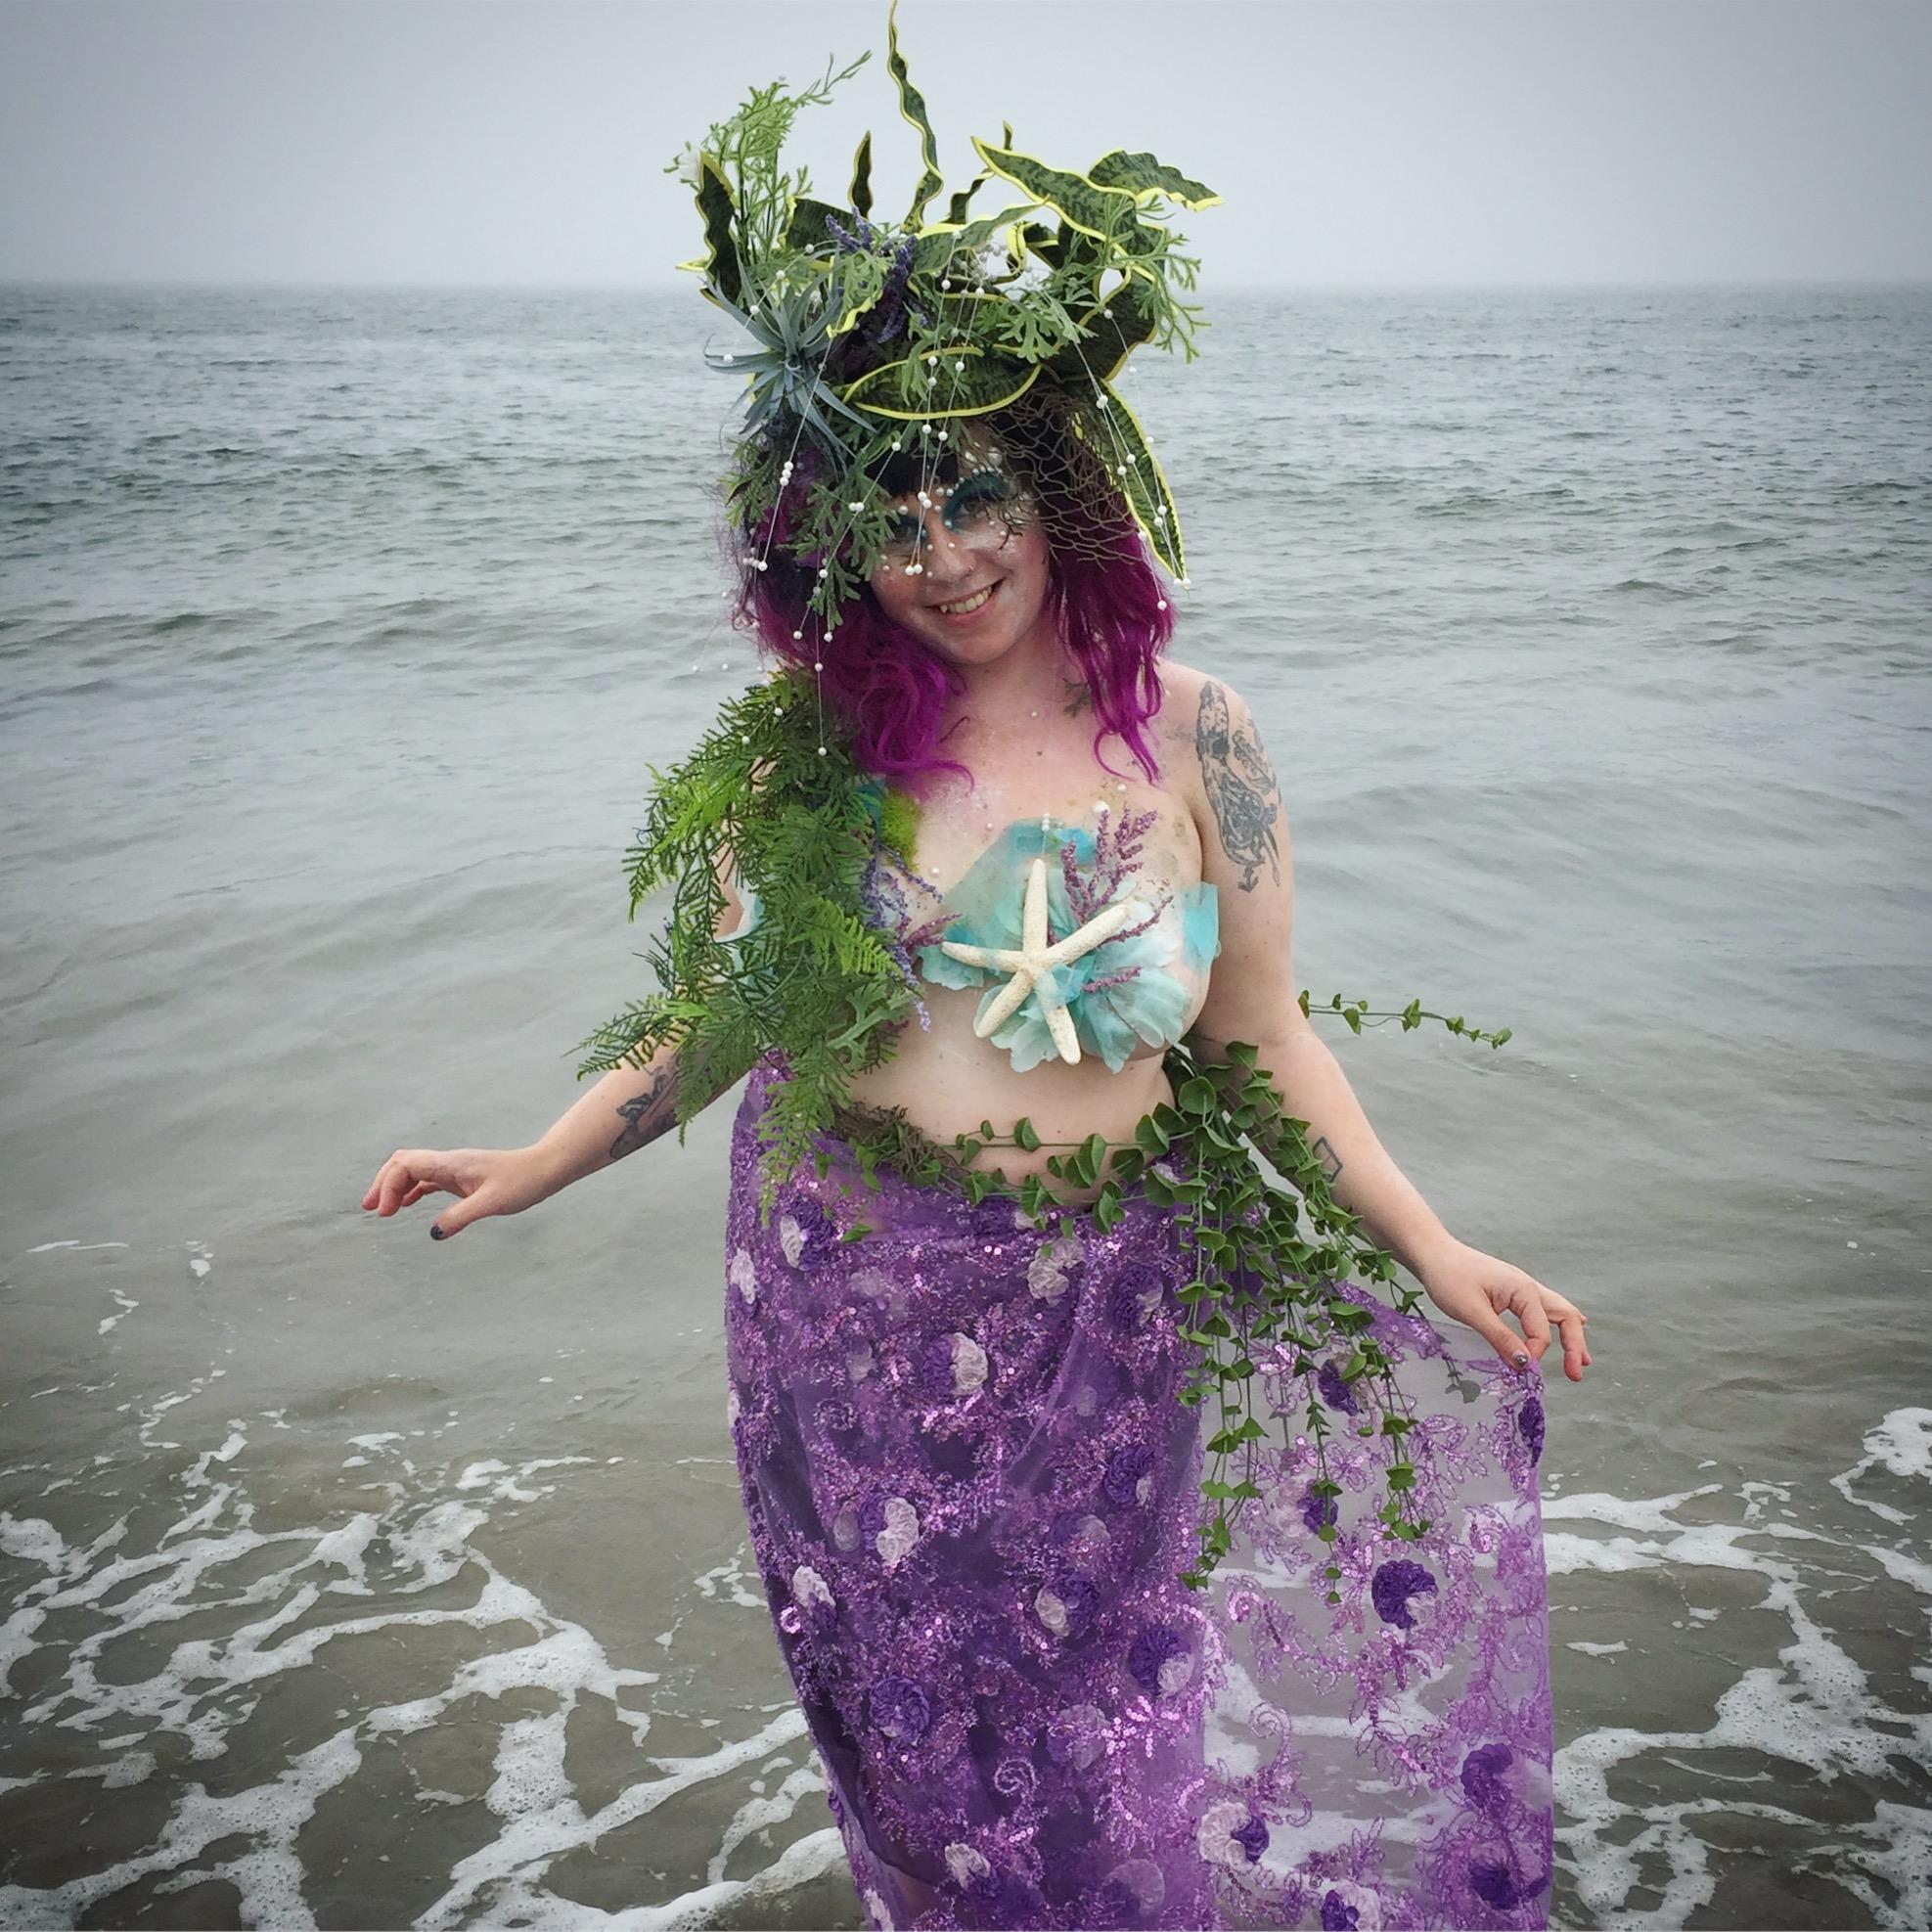 Anglerfish Mermaid Costume //  Coney Island Mermaid Parad e //2017   Kelp headdress // Mermaid tail // Mermaid top // Makeup